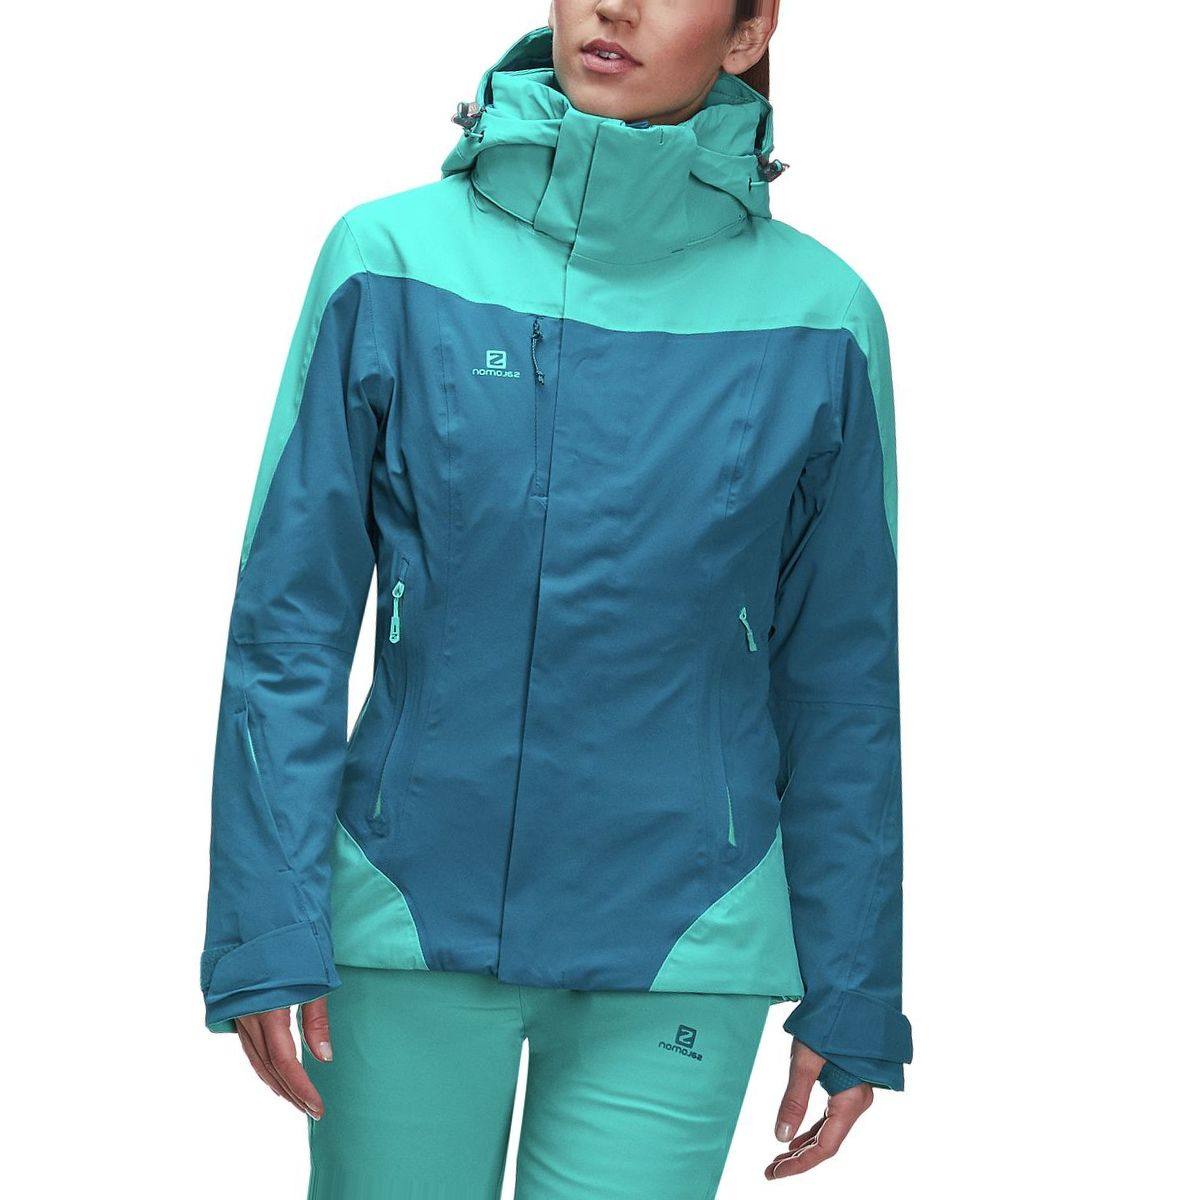 Salomon Icerocket Jacket - Women's